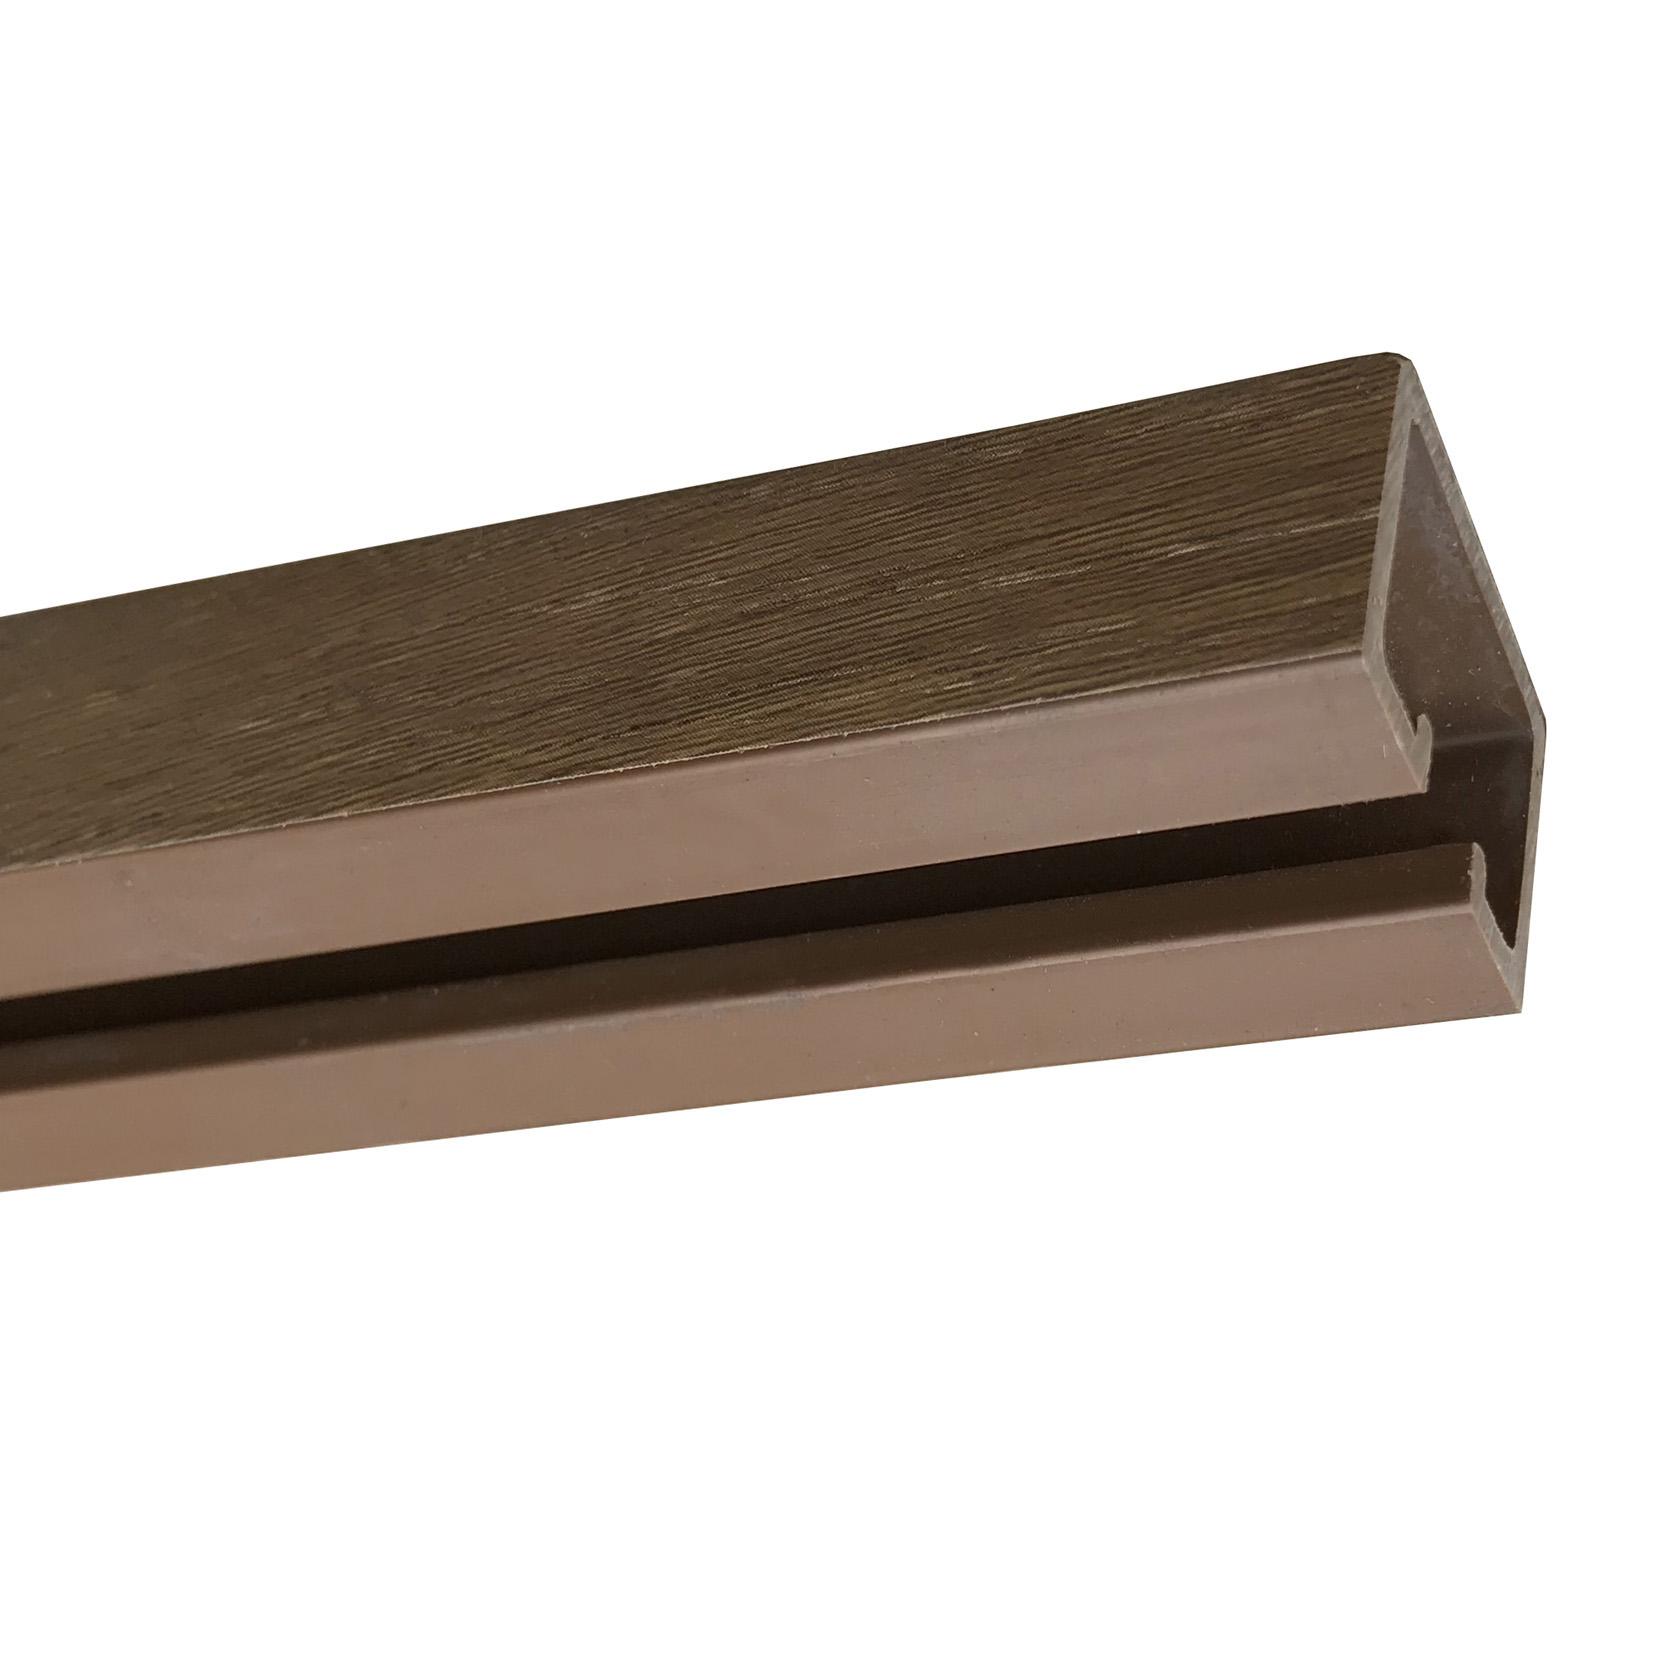 Daintree Walnut Pvc Concertina Door Headrail Extention Pillar Products